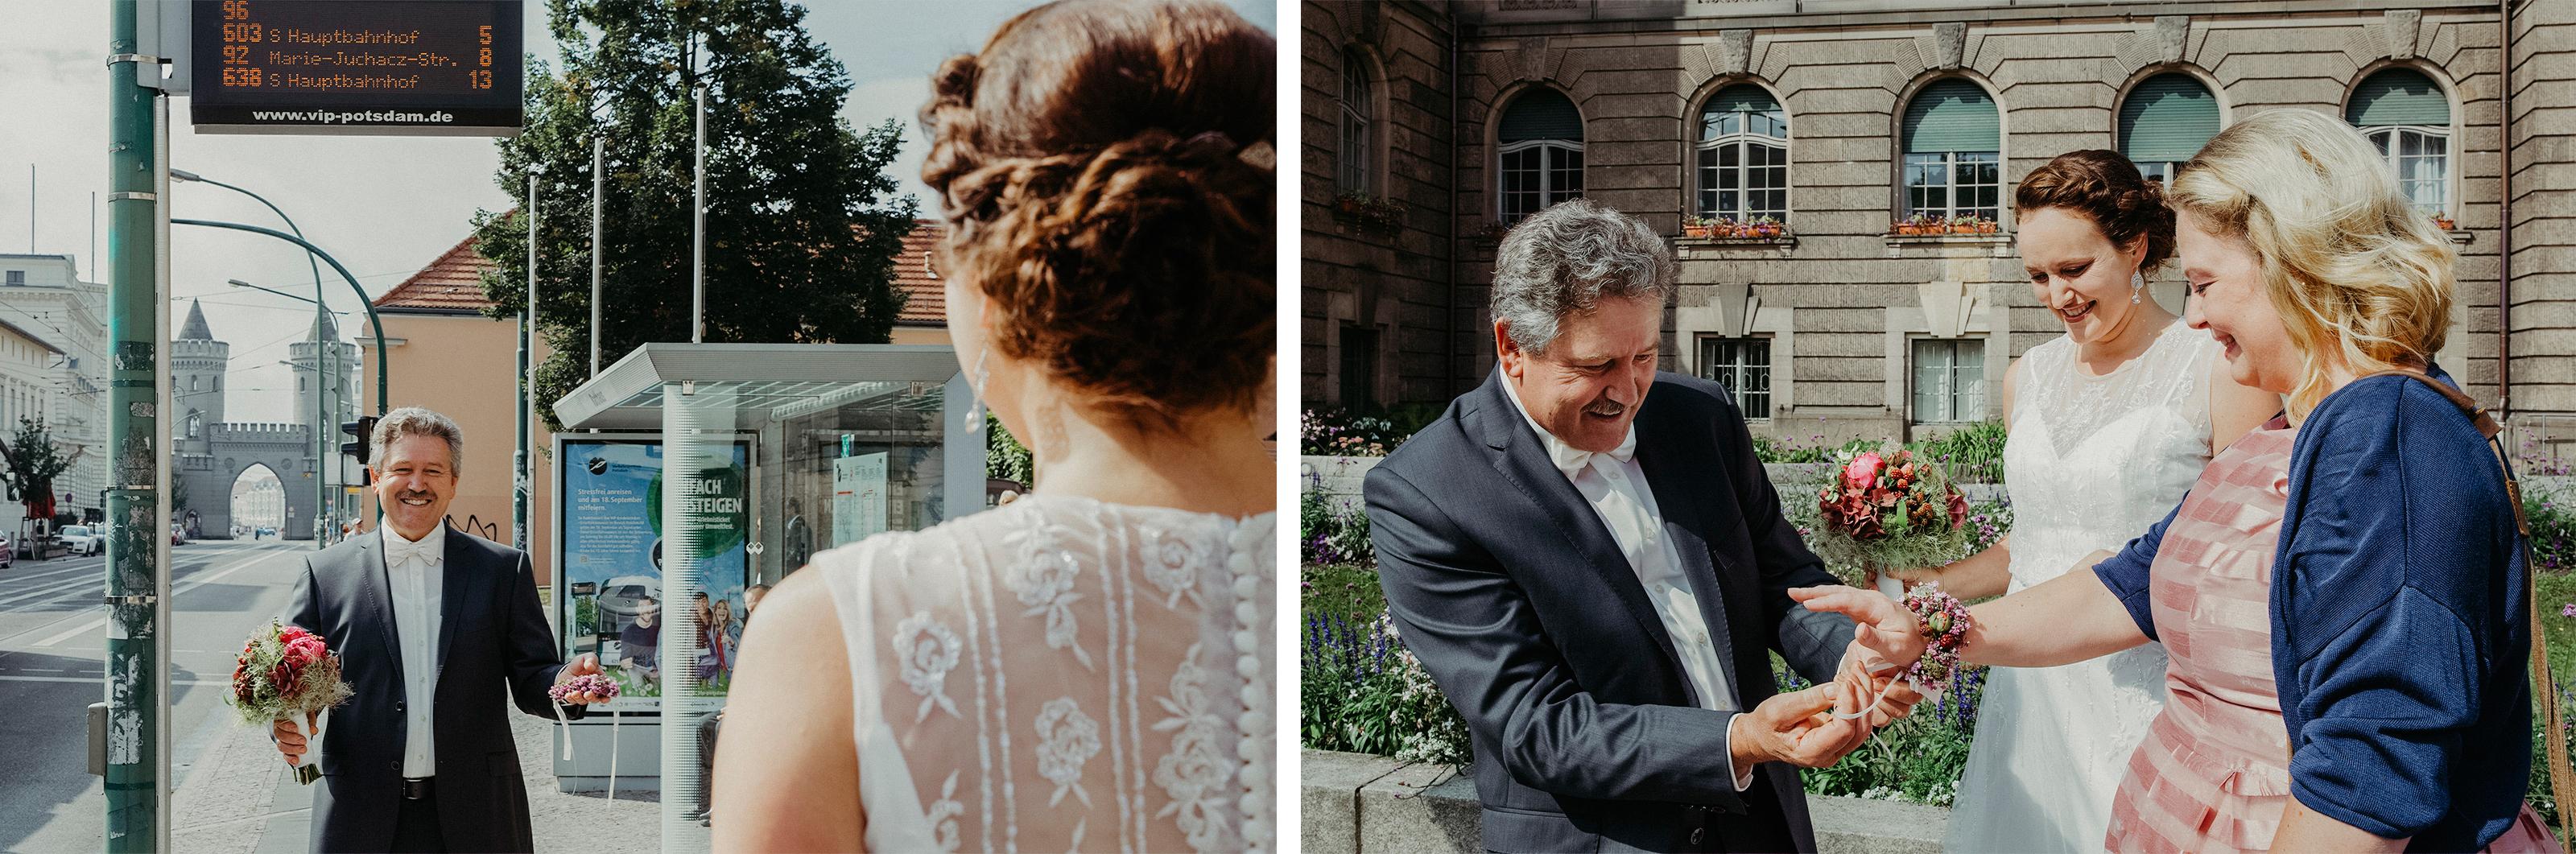 Hochzeit_Potsdam_fotograf_G4_2